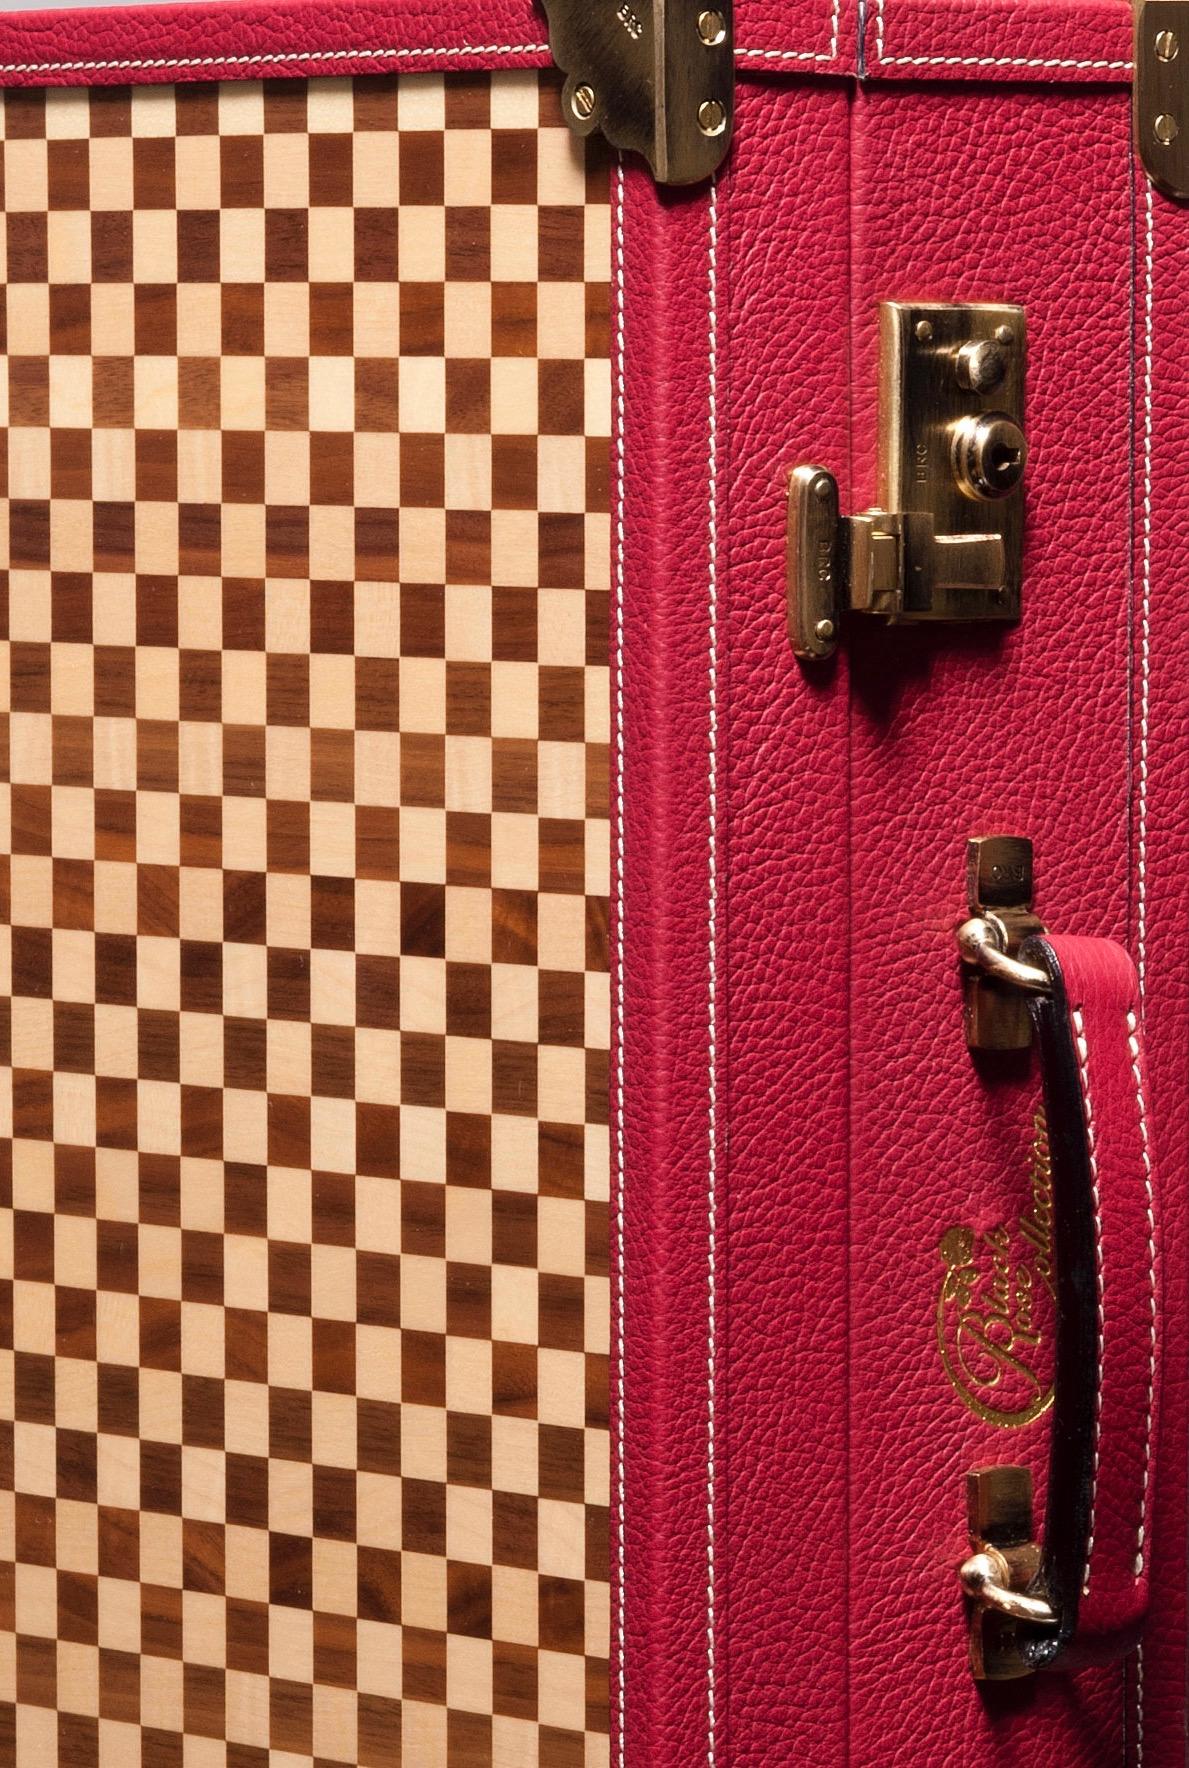 luxury leather bag Mendelssohn close up